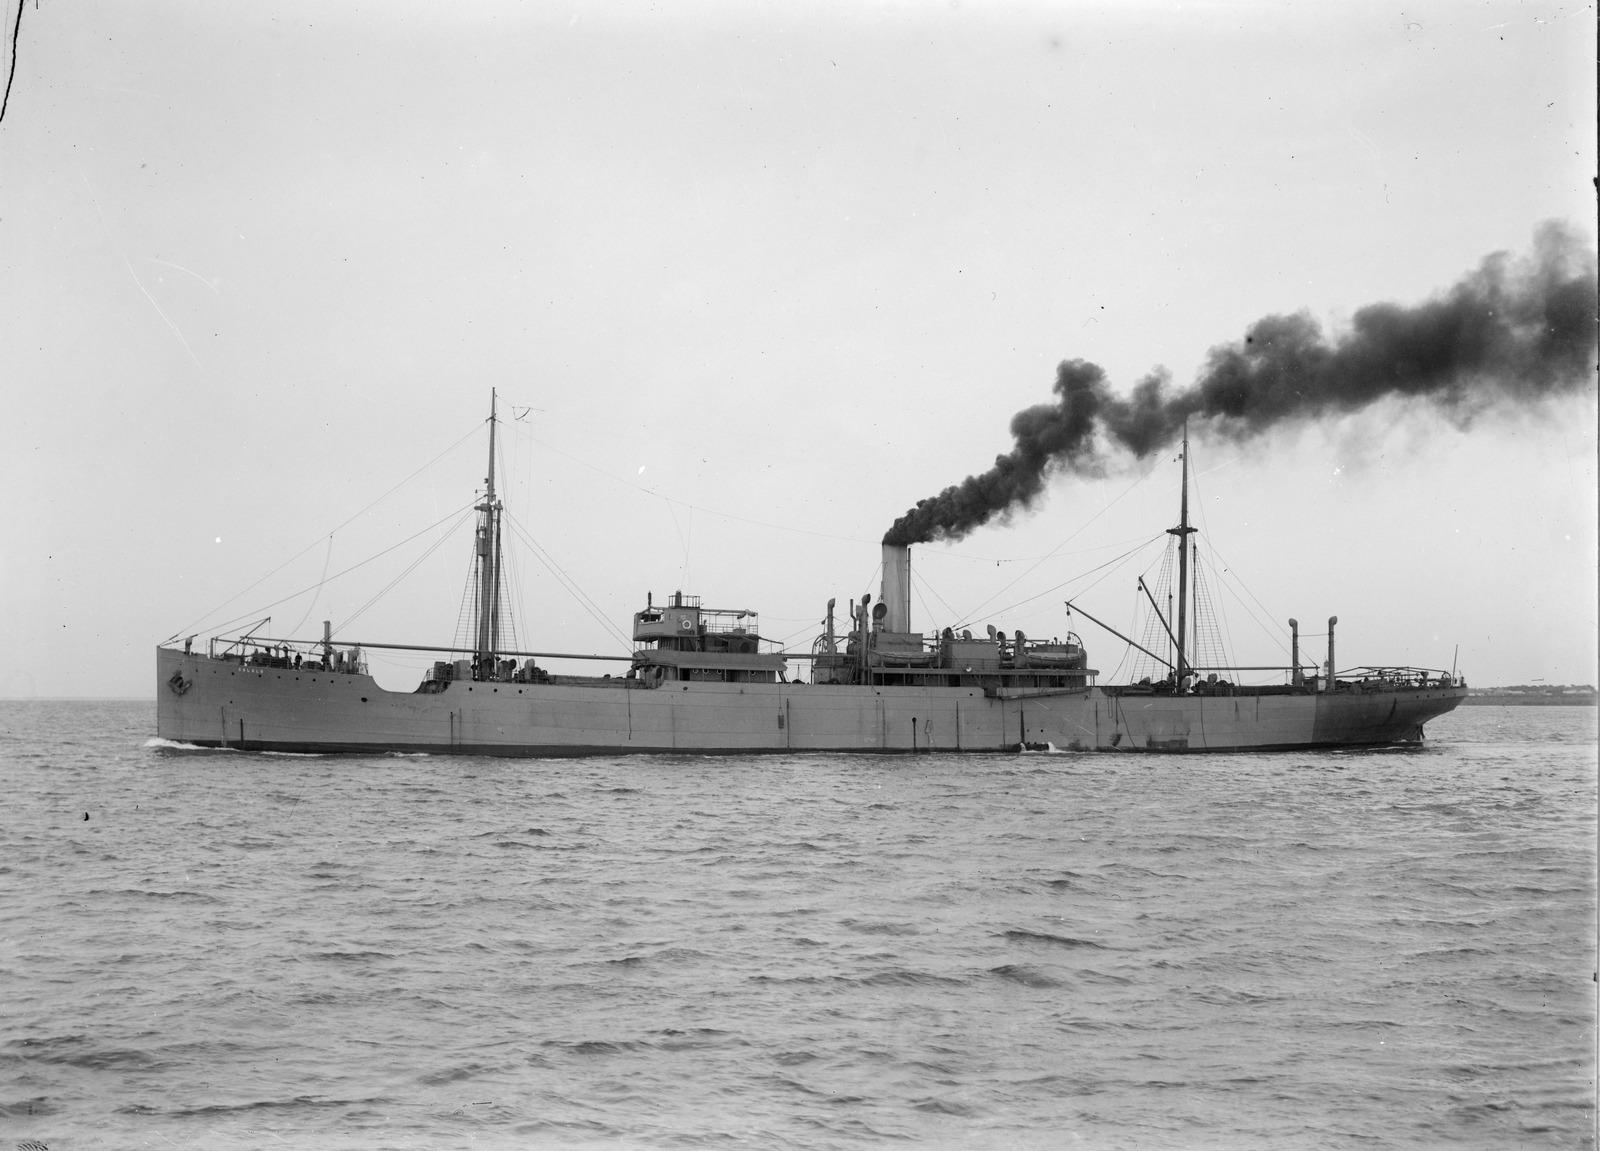 Calulu, exOsnabruck, about 1920